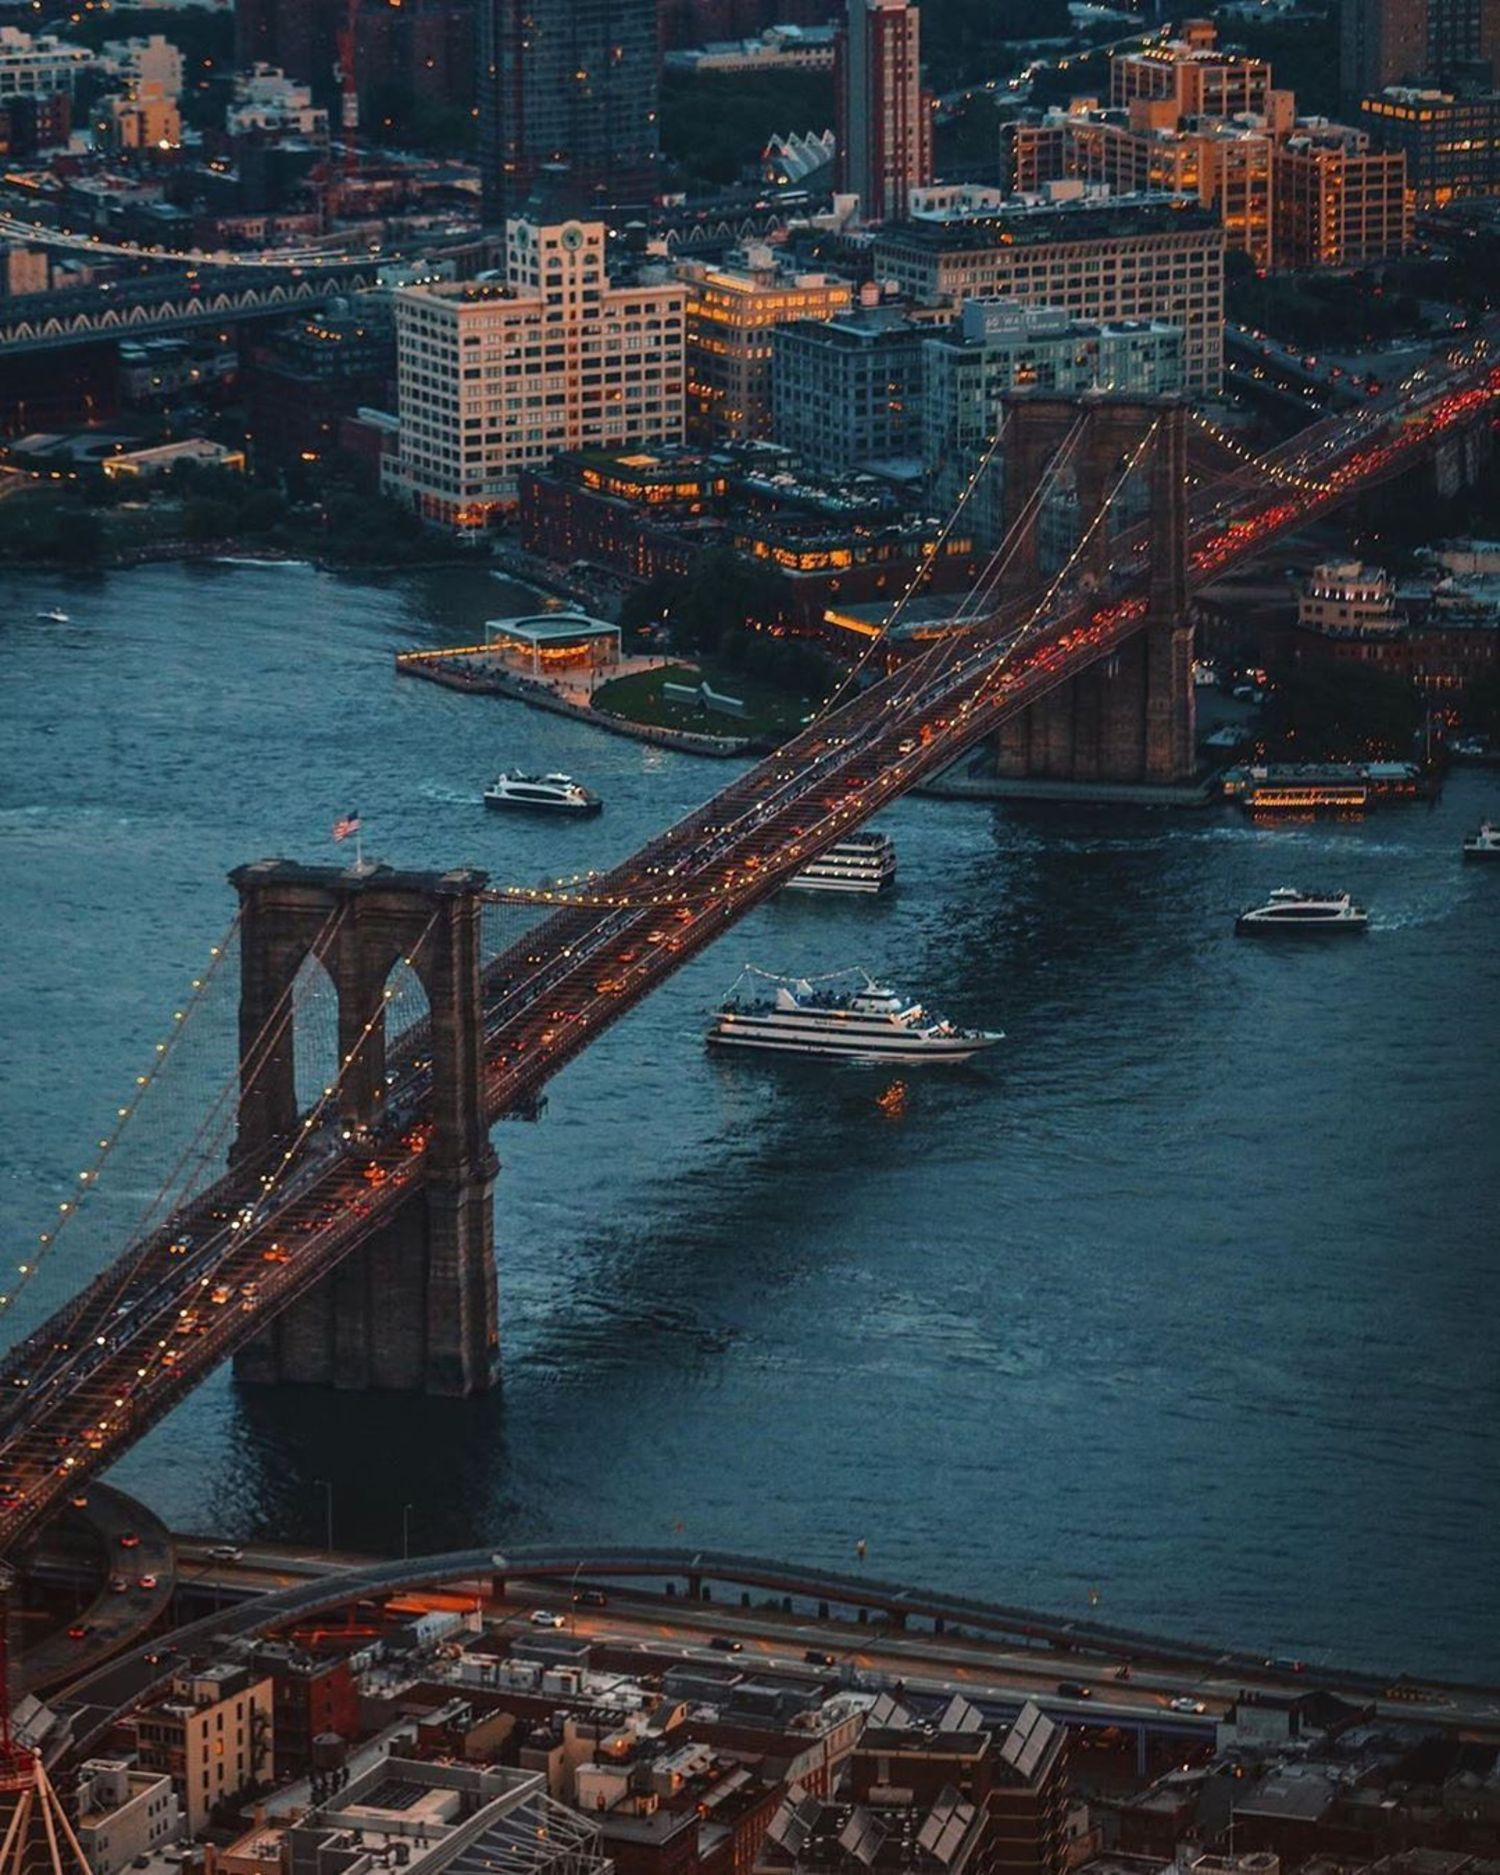 Brooklyn Bridge, New York, New York.